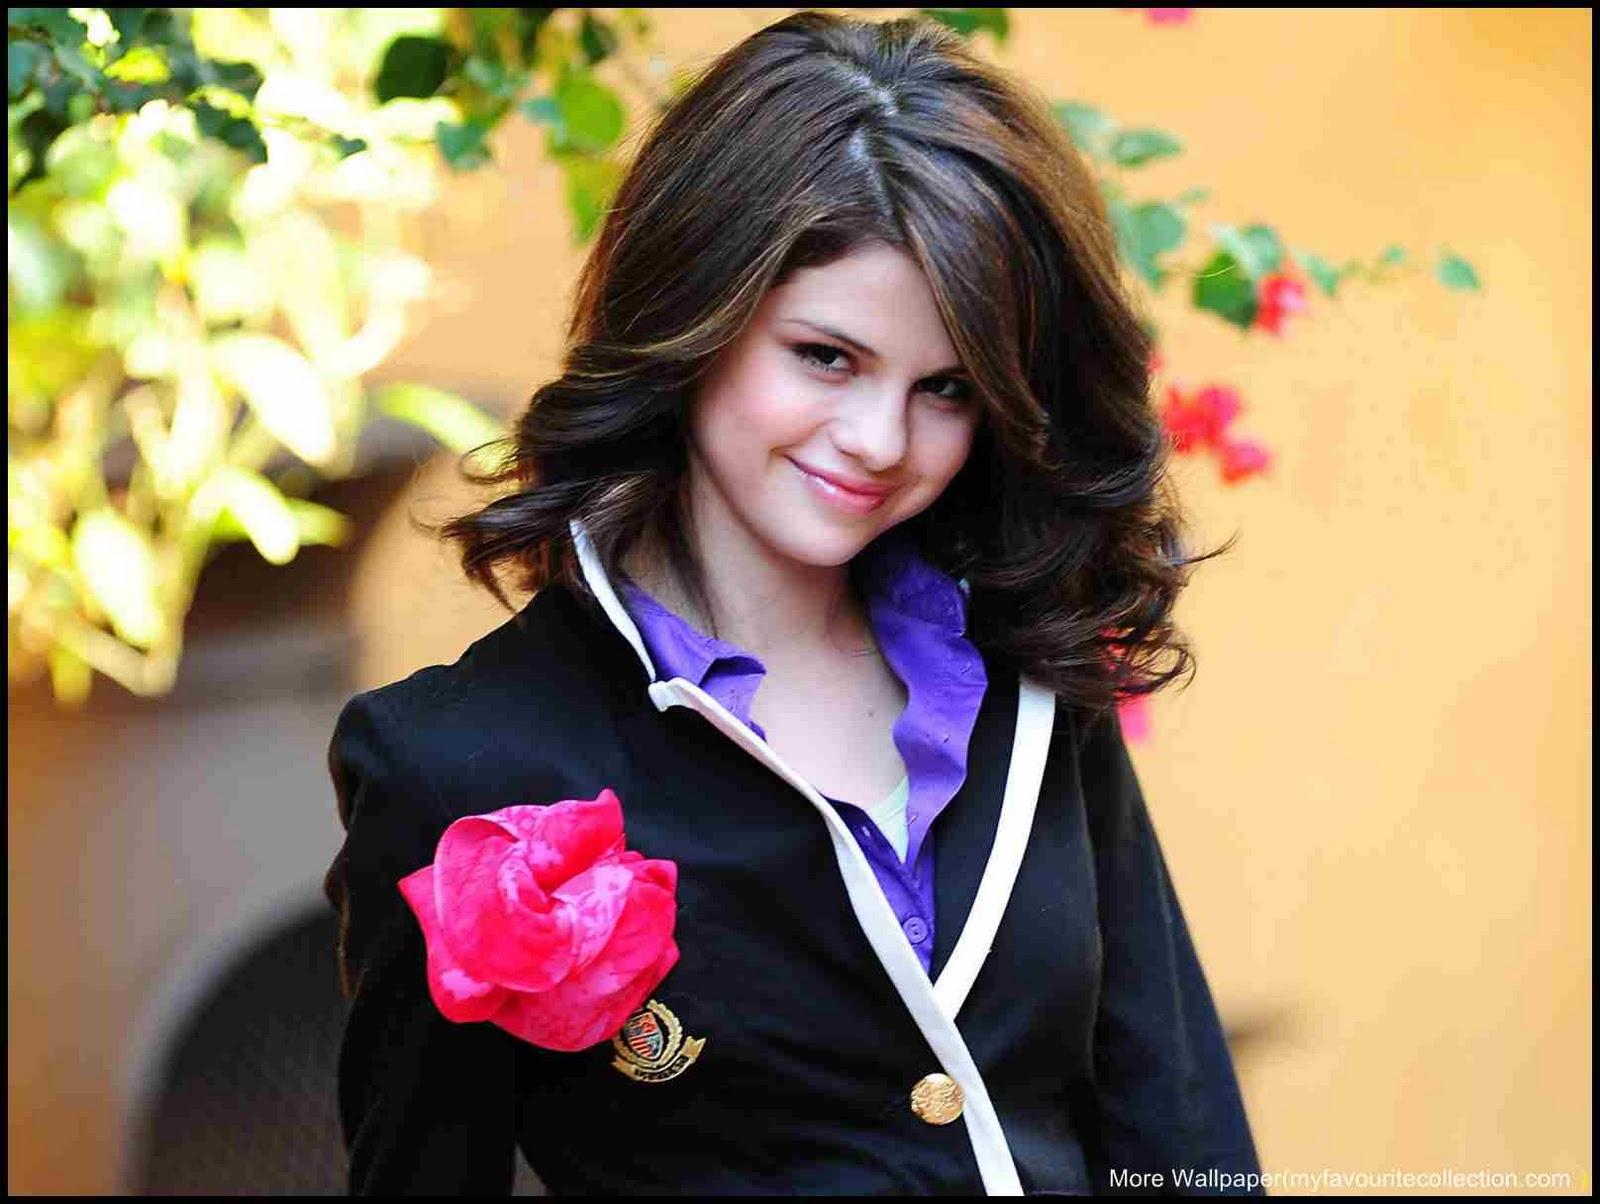 http://4.bp.blogspot.com/-Yz_RwoScRpo/TrdcmZDkiII/AAAAAAAAAjs/UJH9NzCyzk0/s1600/Beautiful-Sweet-Selena-Gomez-Exclusive-Free-Wallpaper_11-1600x1200.jpg